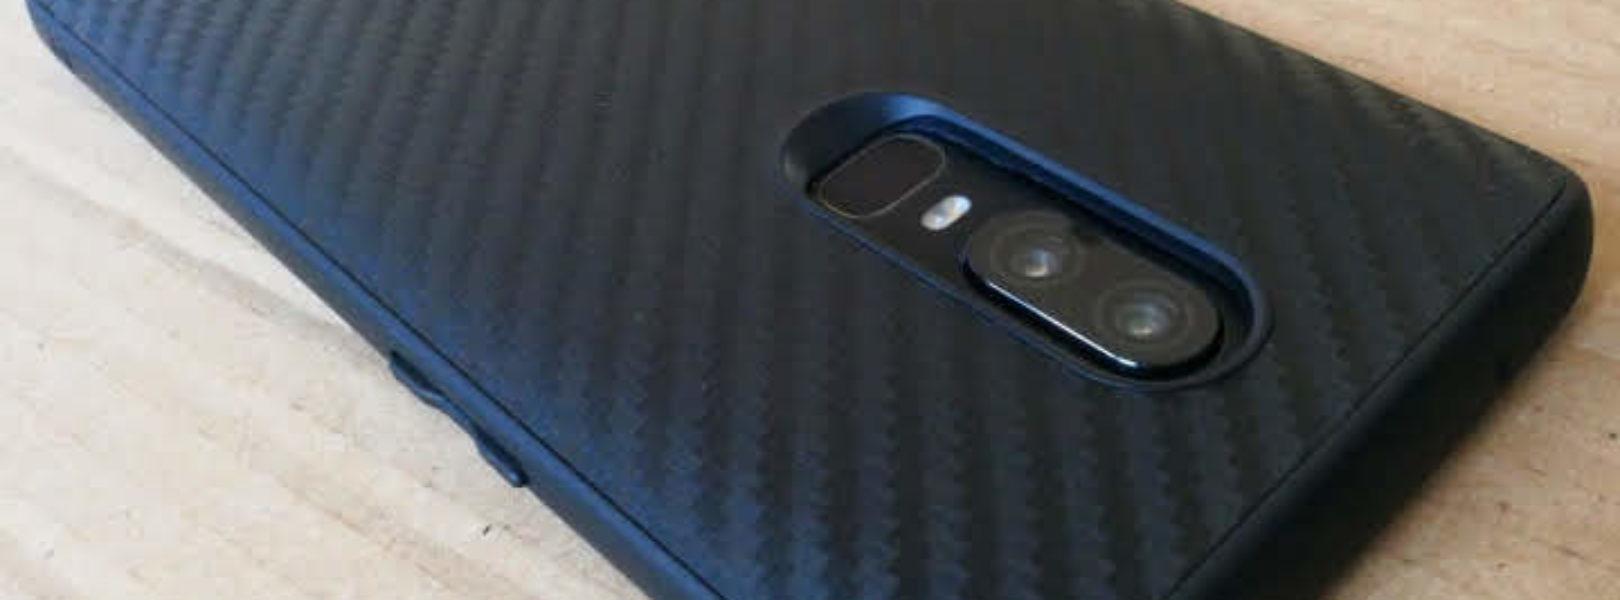 official photos 54b31 65303 OnePlus 6 Archives - DroidHorizon